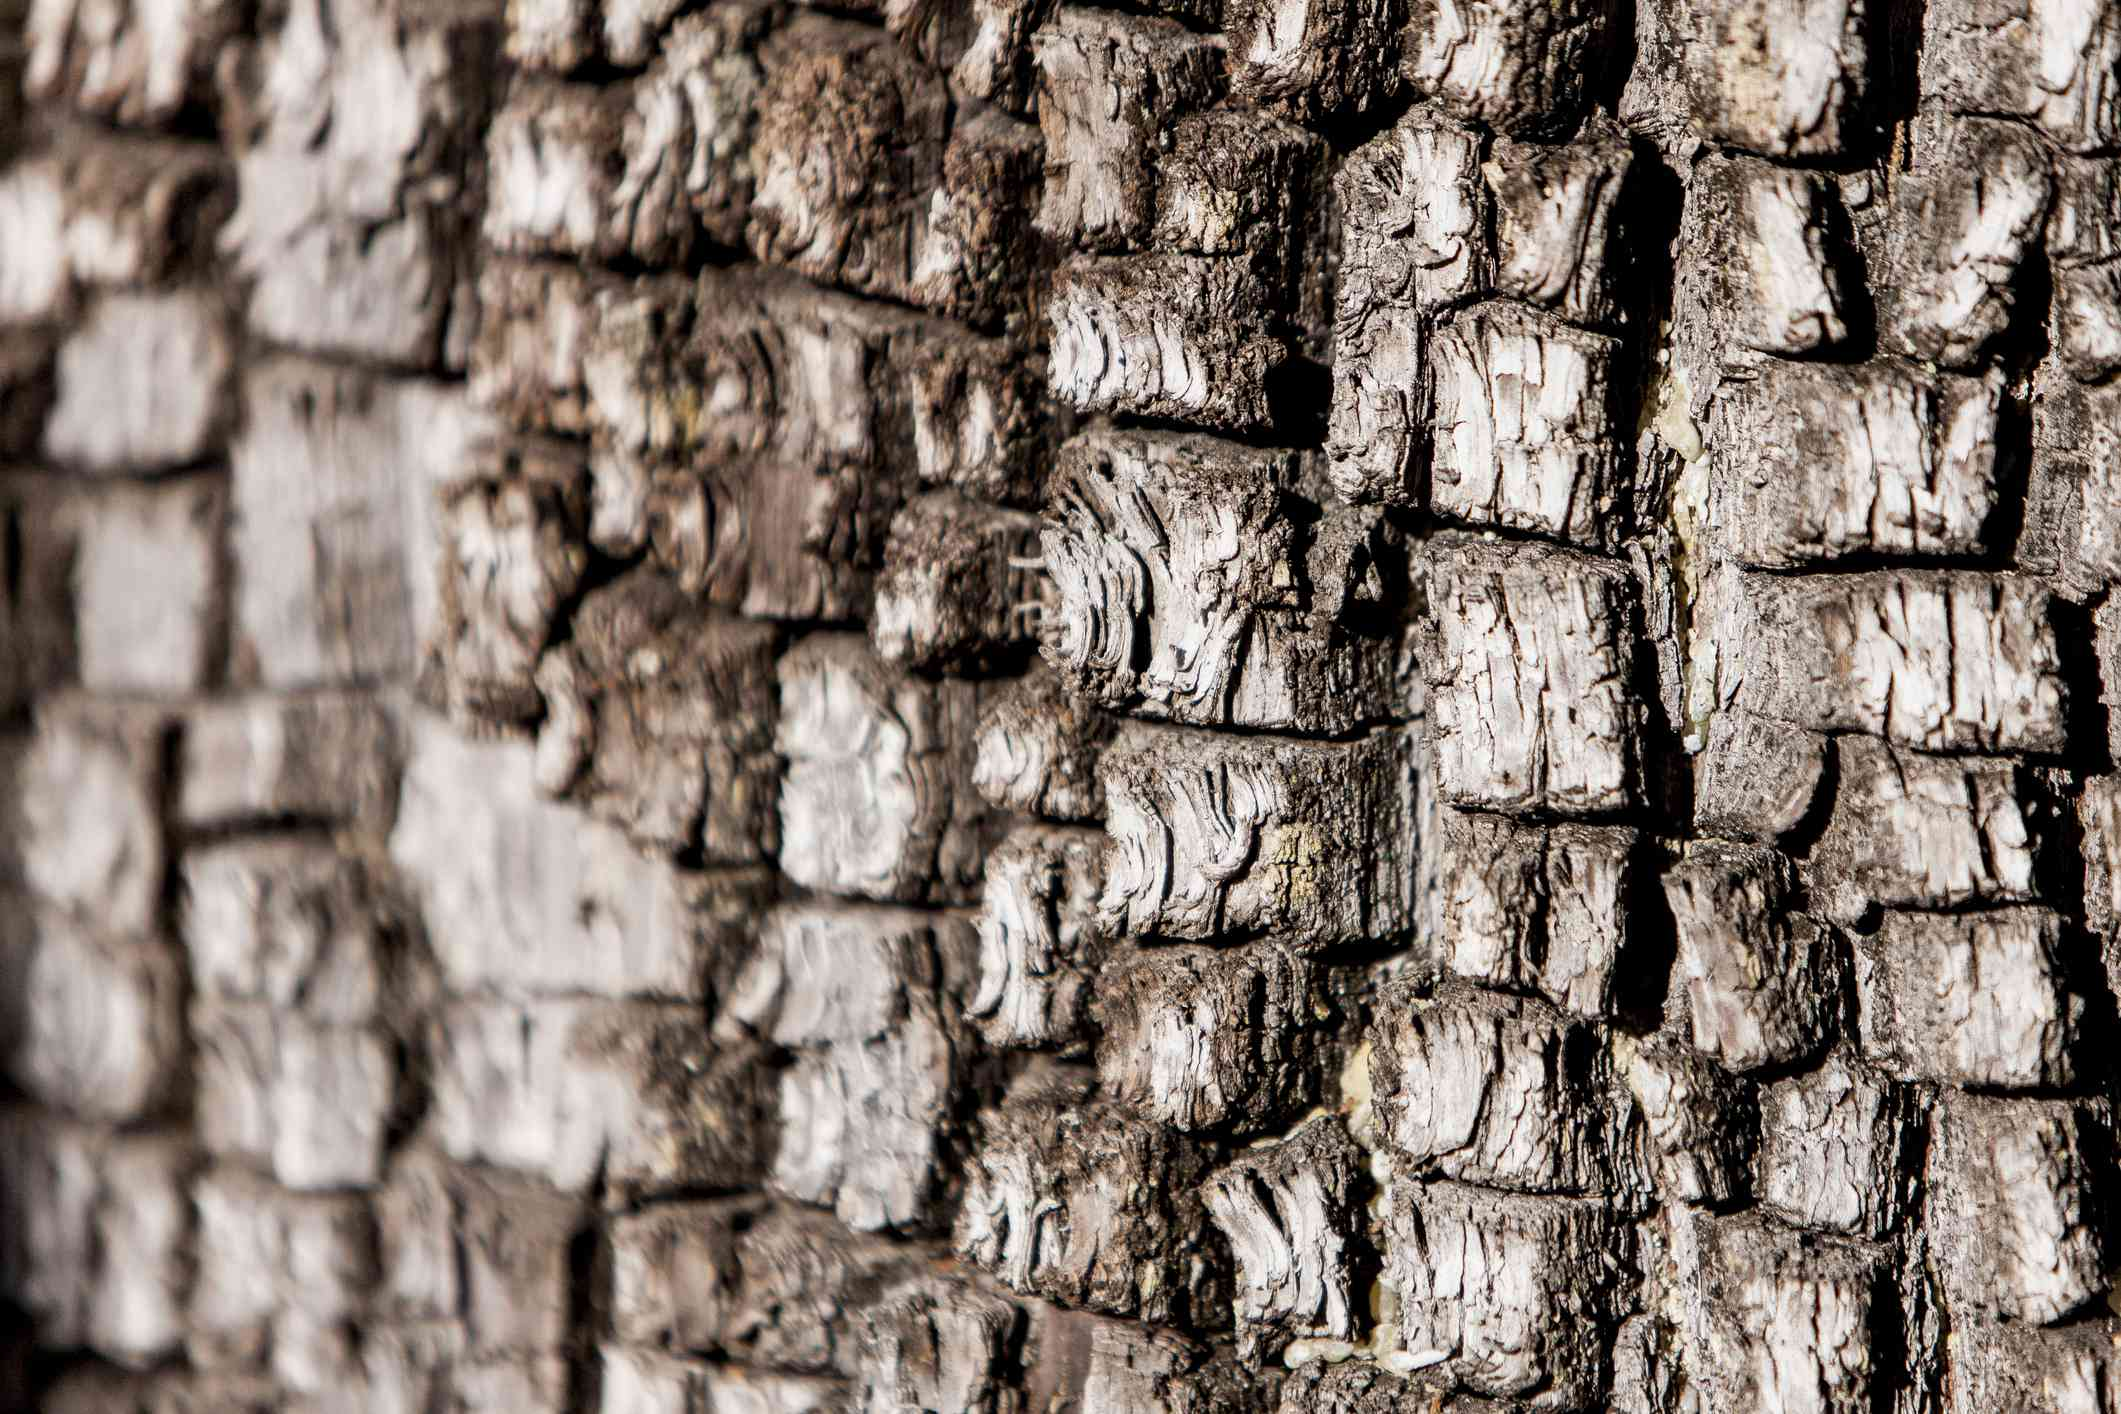 Alligator Bark